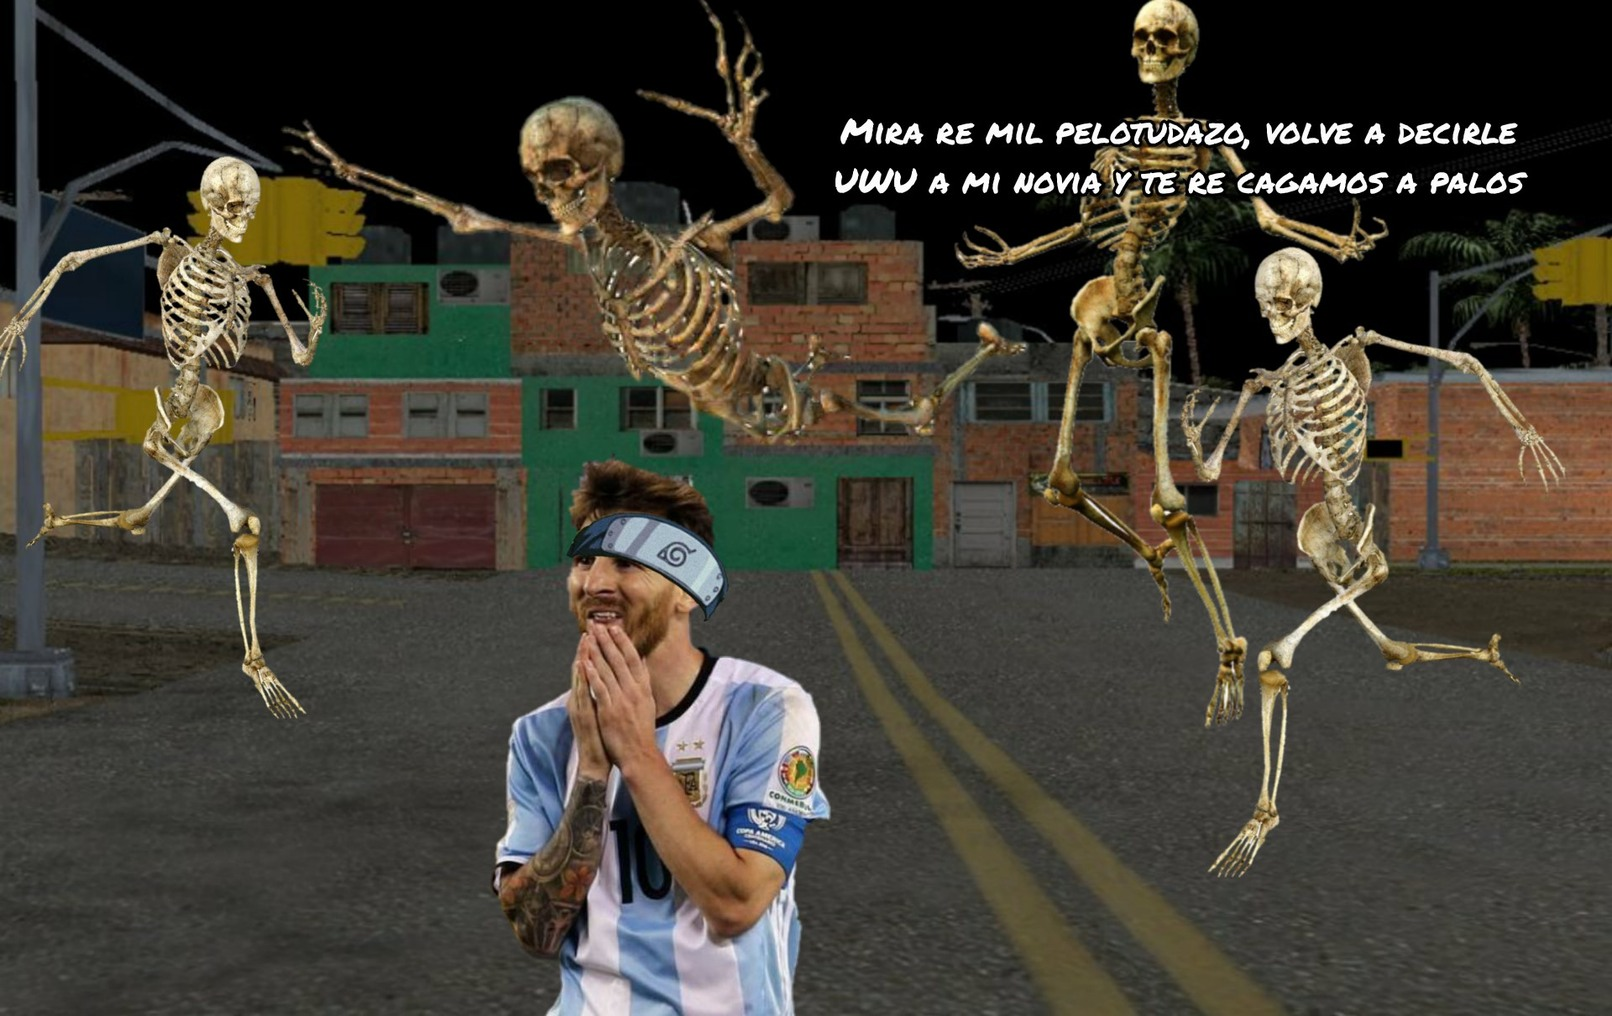 Messi Otaku ediondo - meme